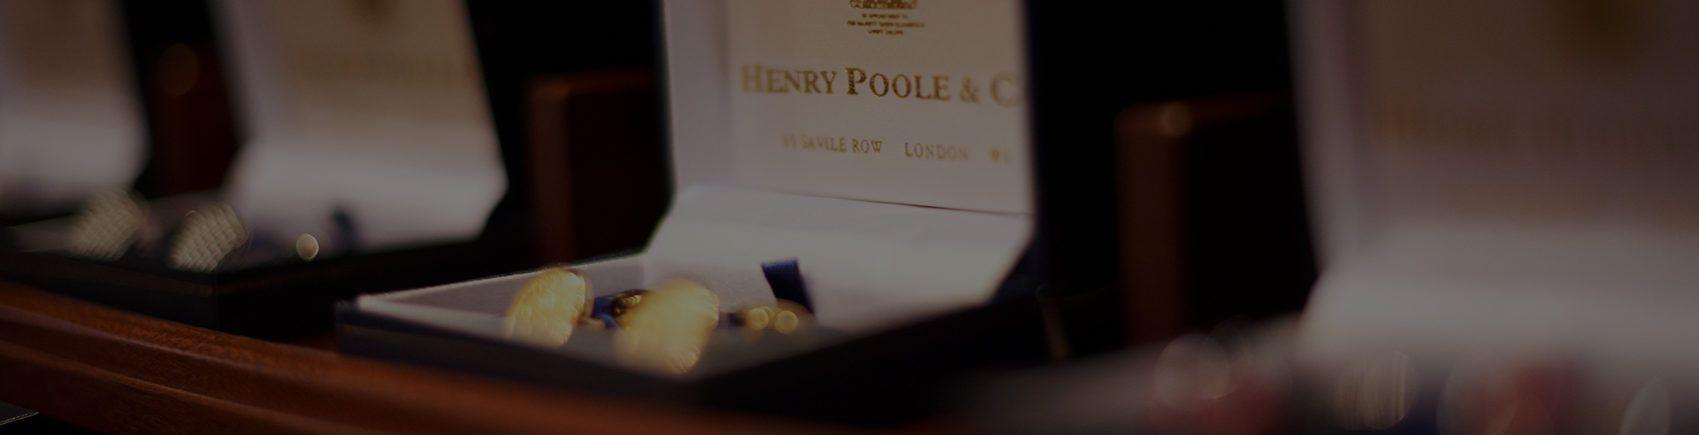 Henry Poole Savile Row Tailors Shop Cufflinks 2